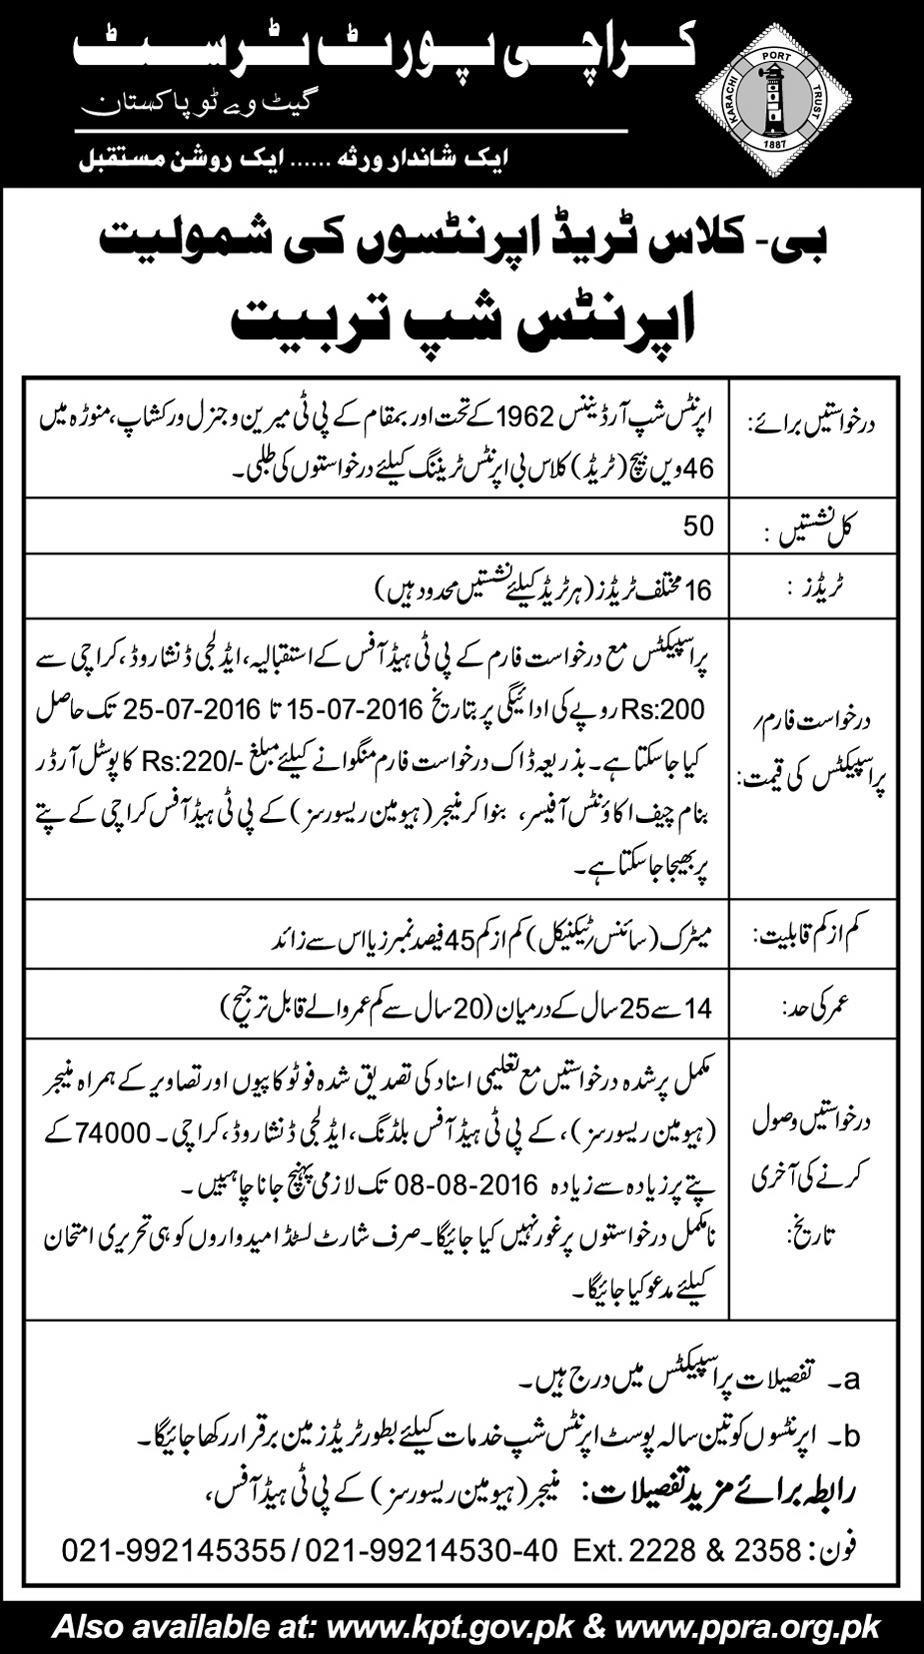 Karachi Port Trust 50 Apprenticeship Opportunities